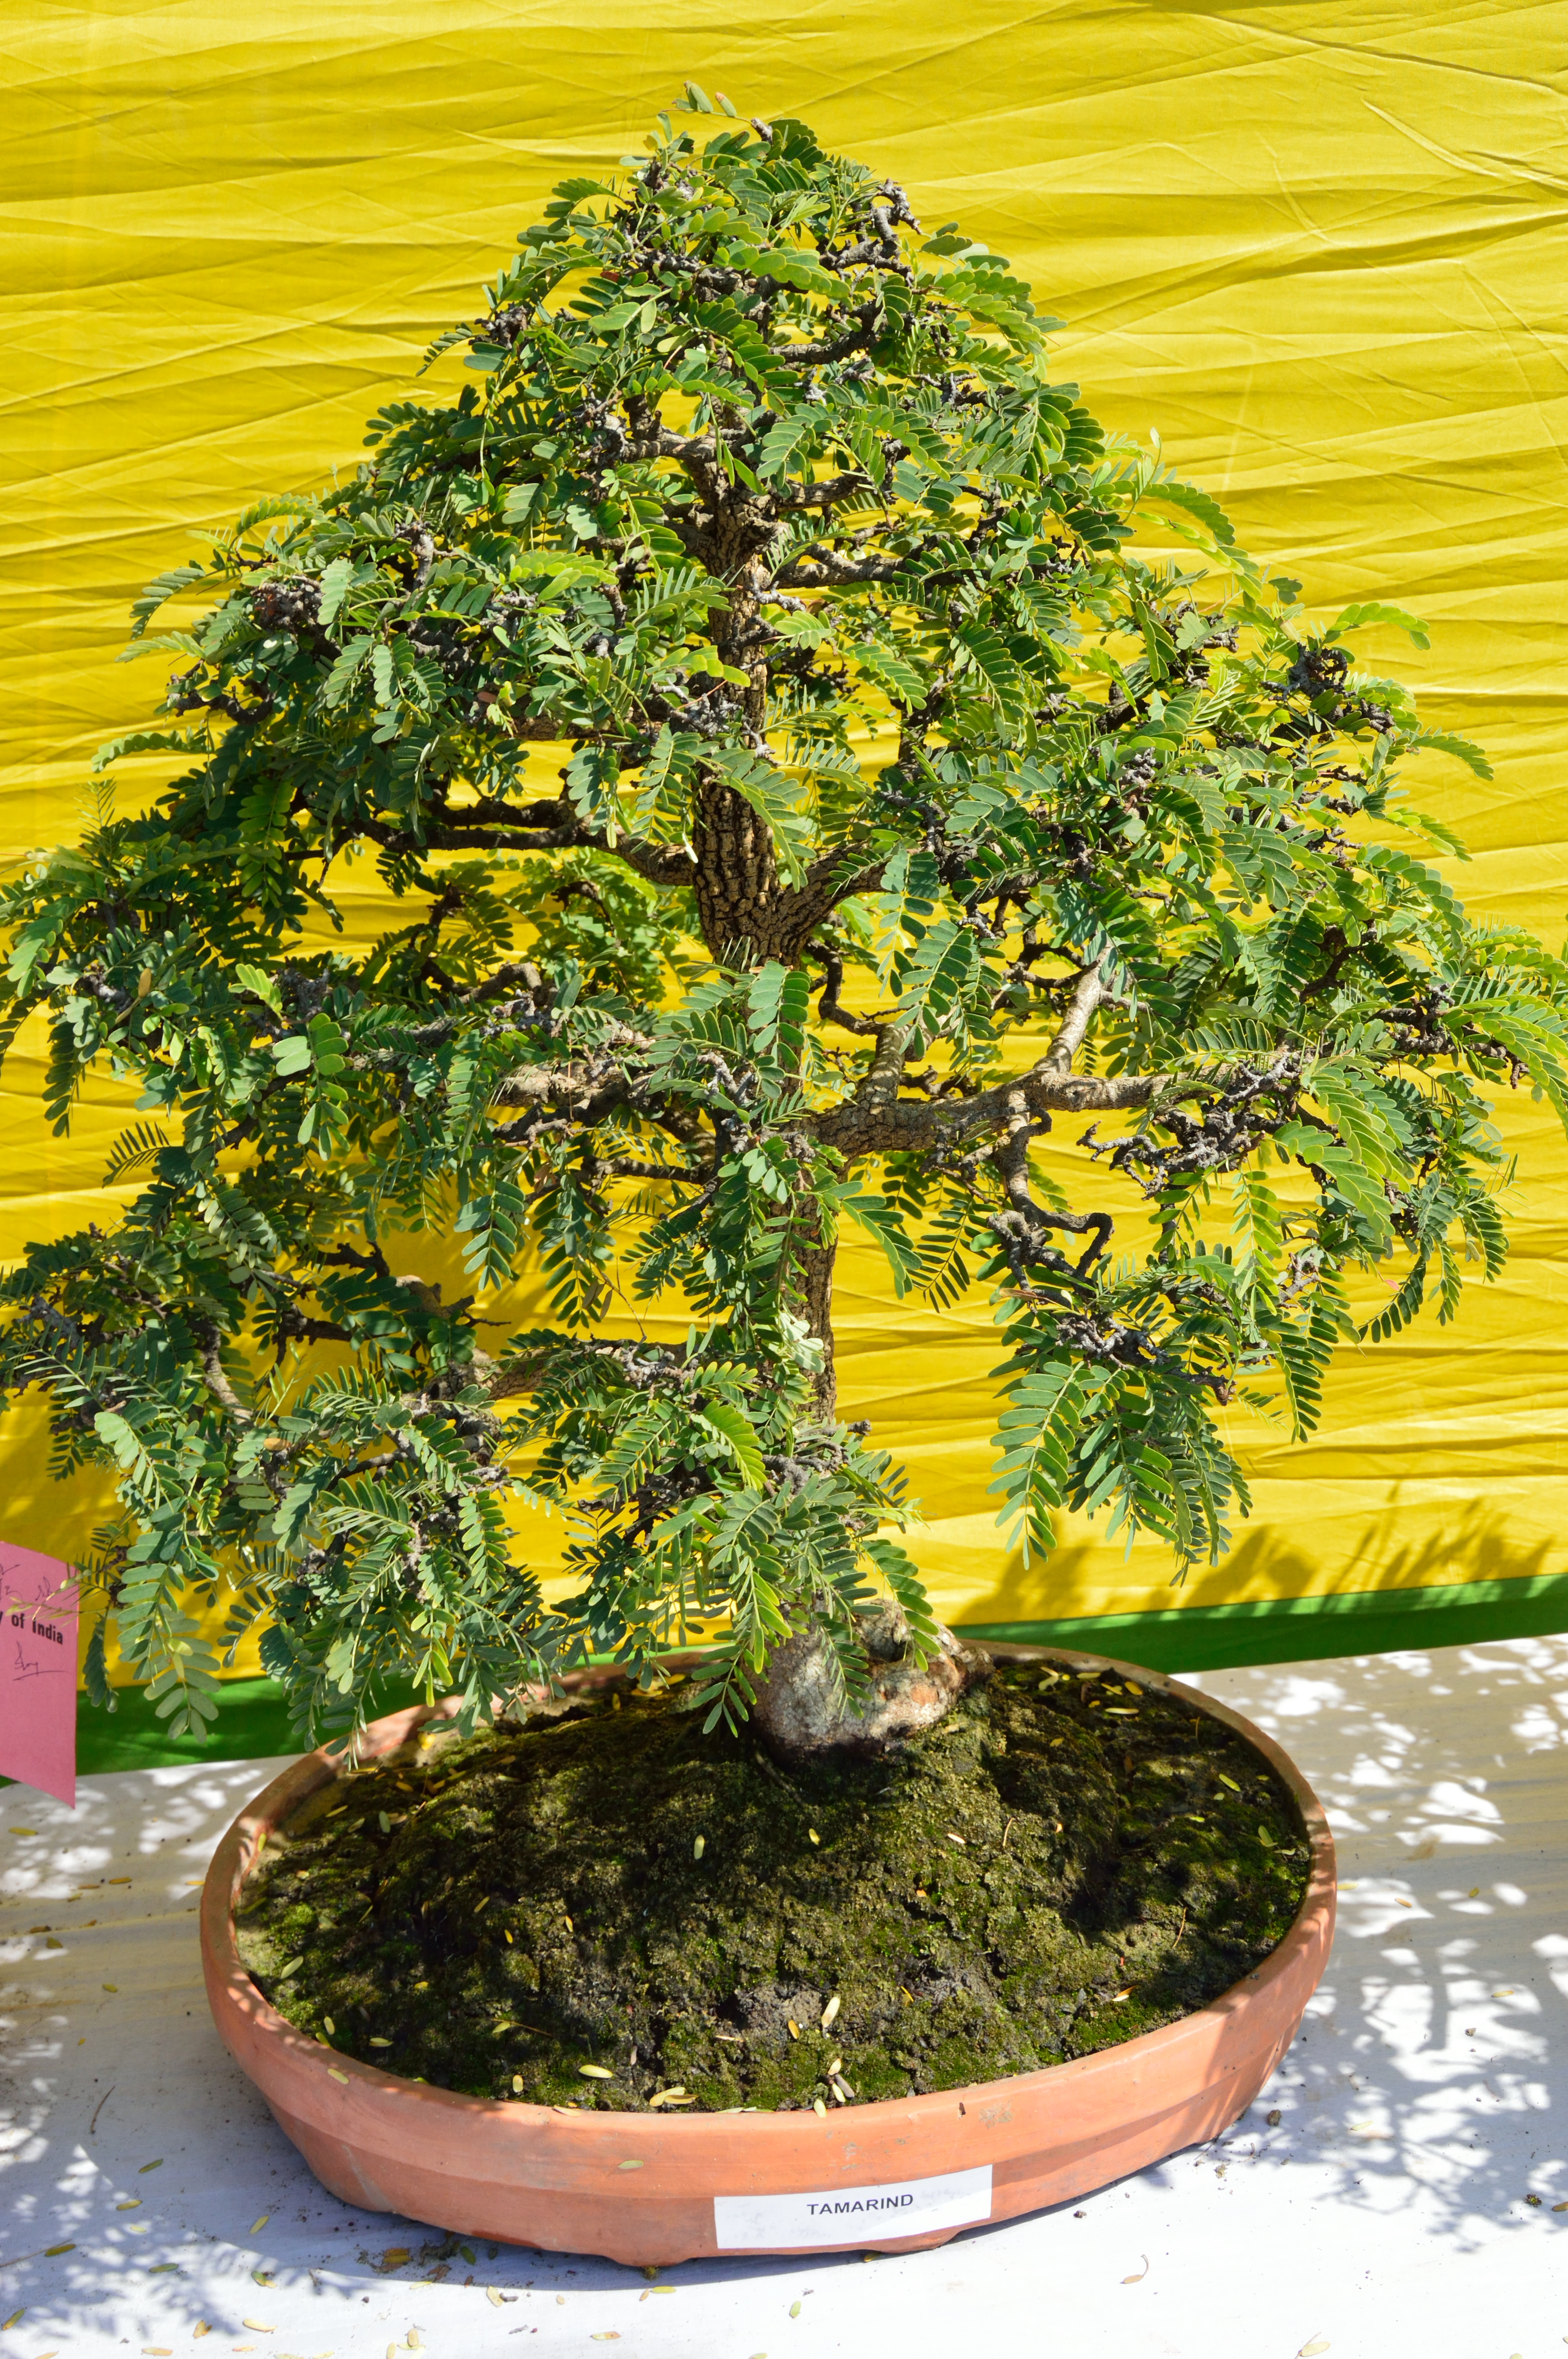 File Tamarindus Indica Bonsai Alipore Kolkata 2013 02 10 4671 Jpg Wikimedia Commons